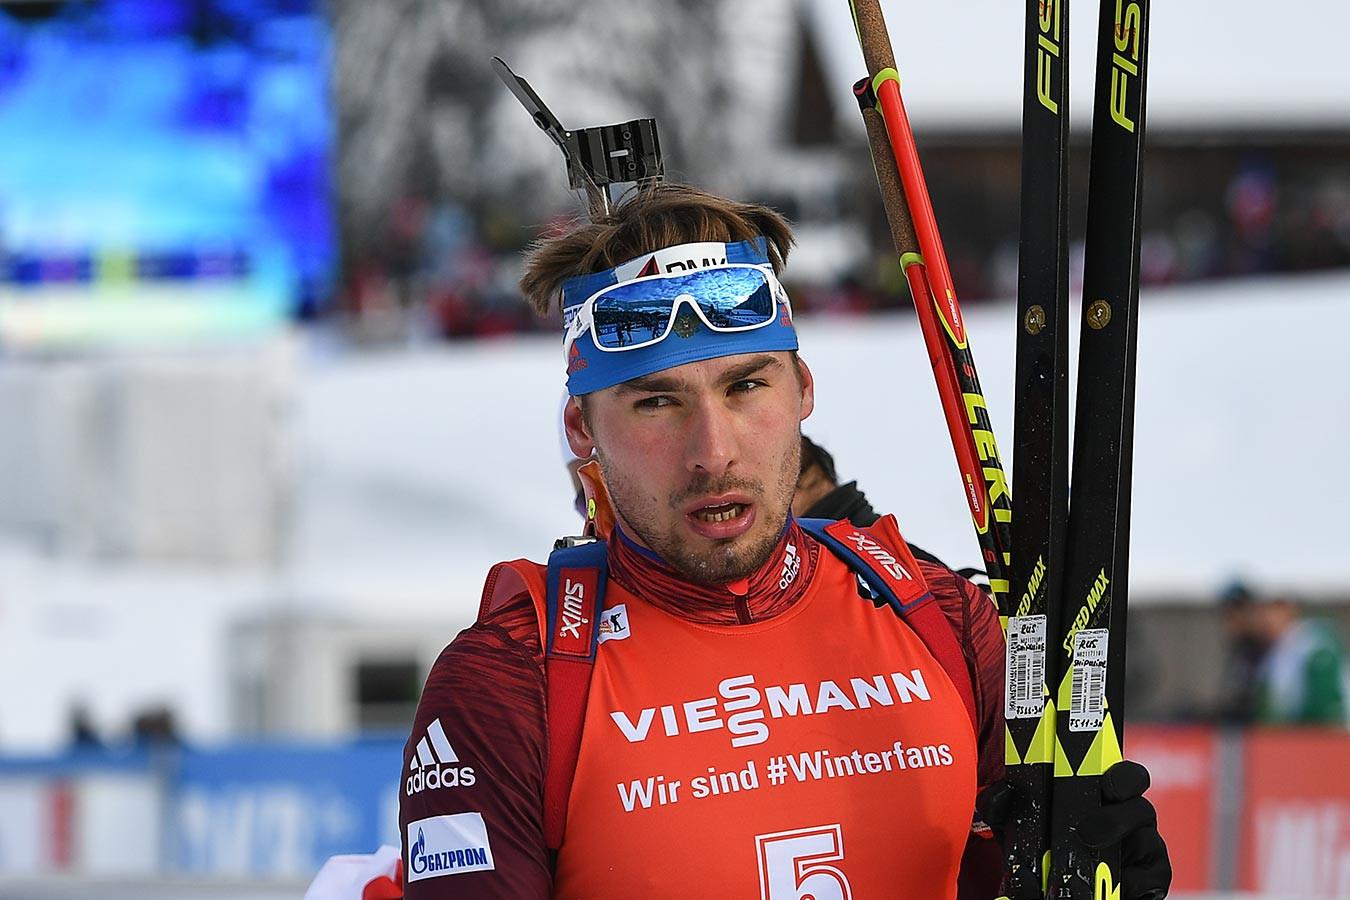 Фото российского биатлониста шипулина